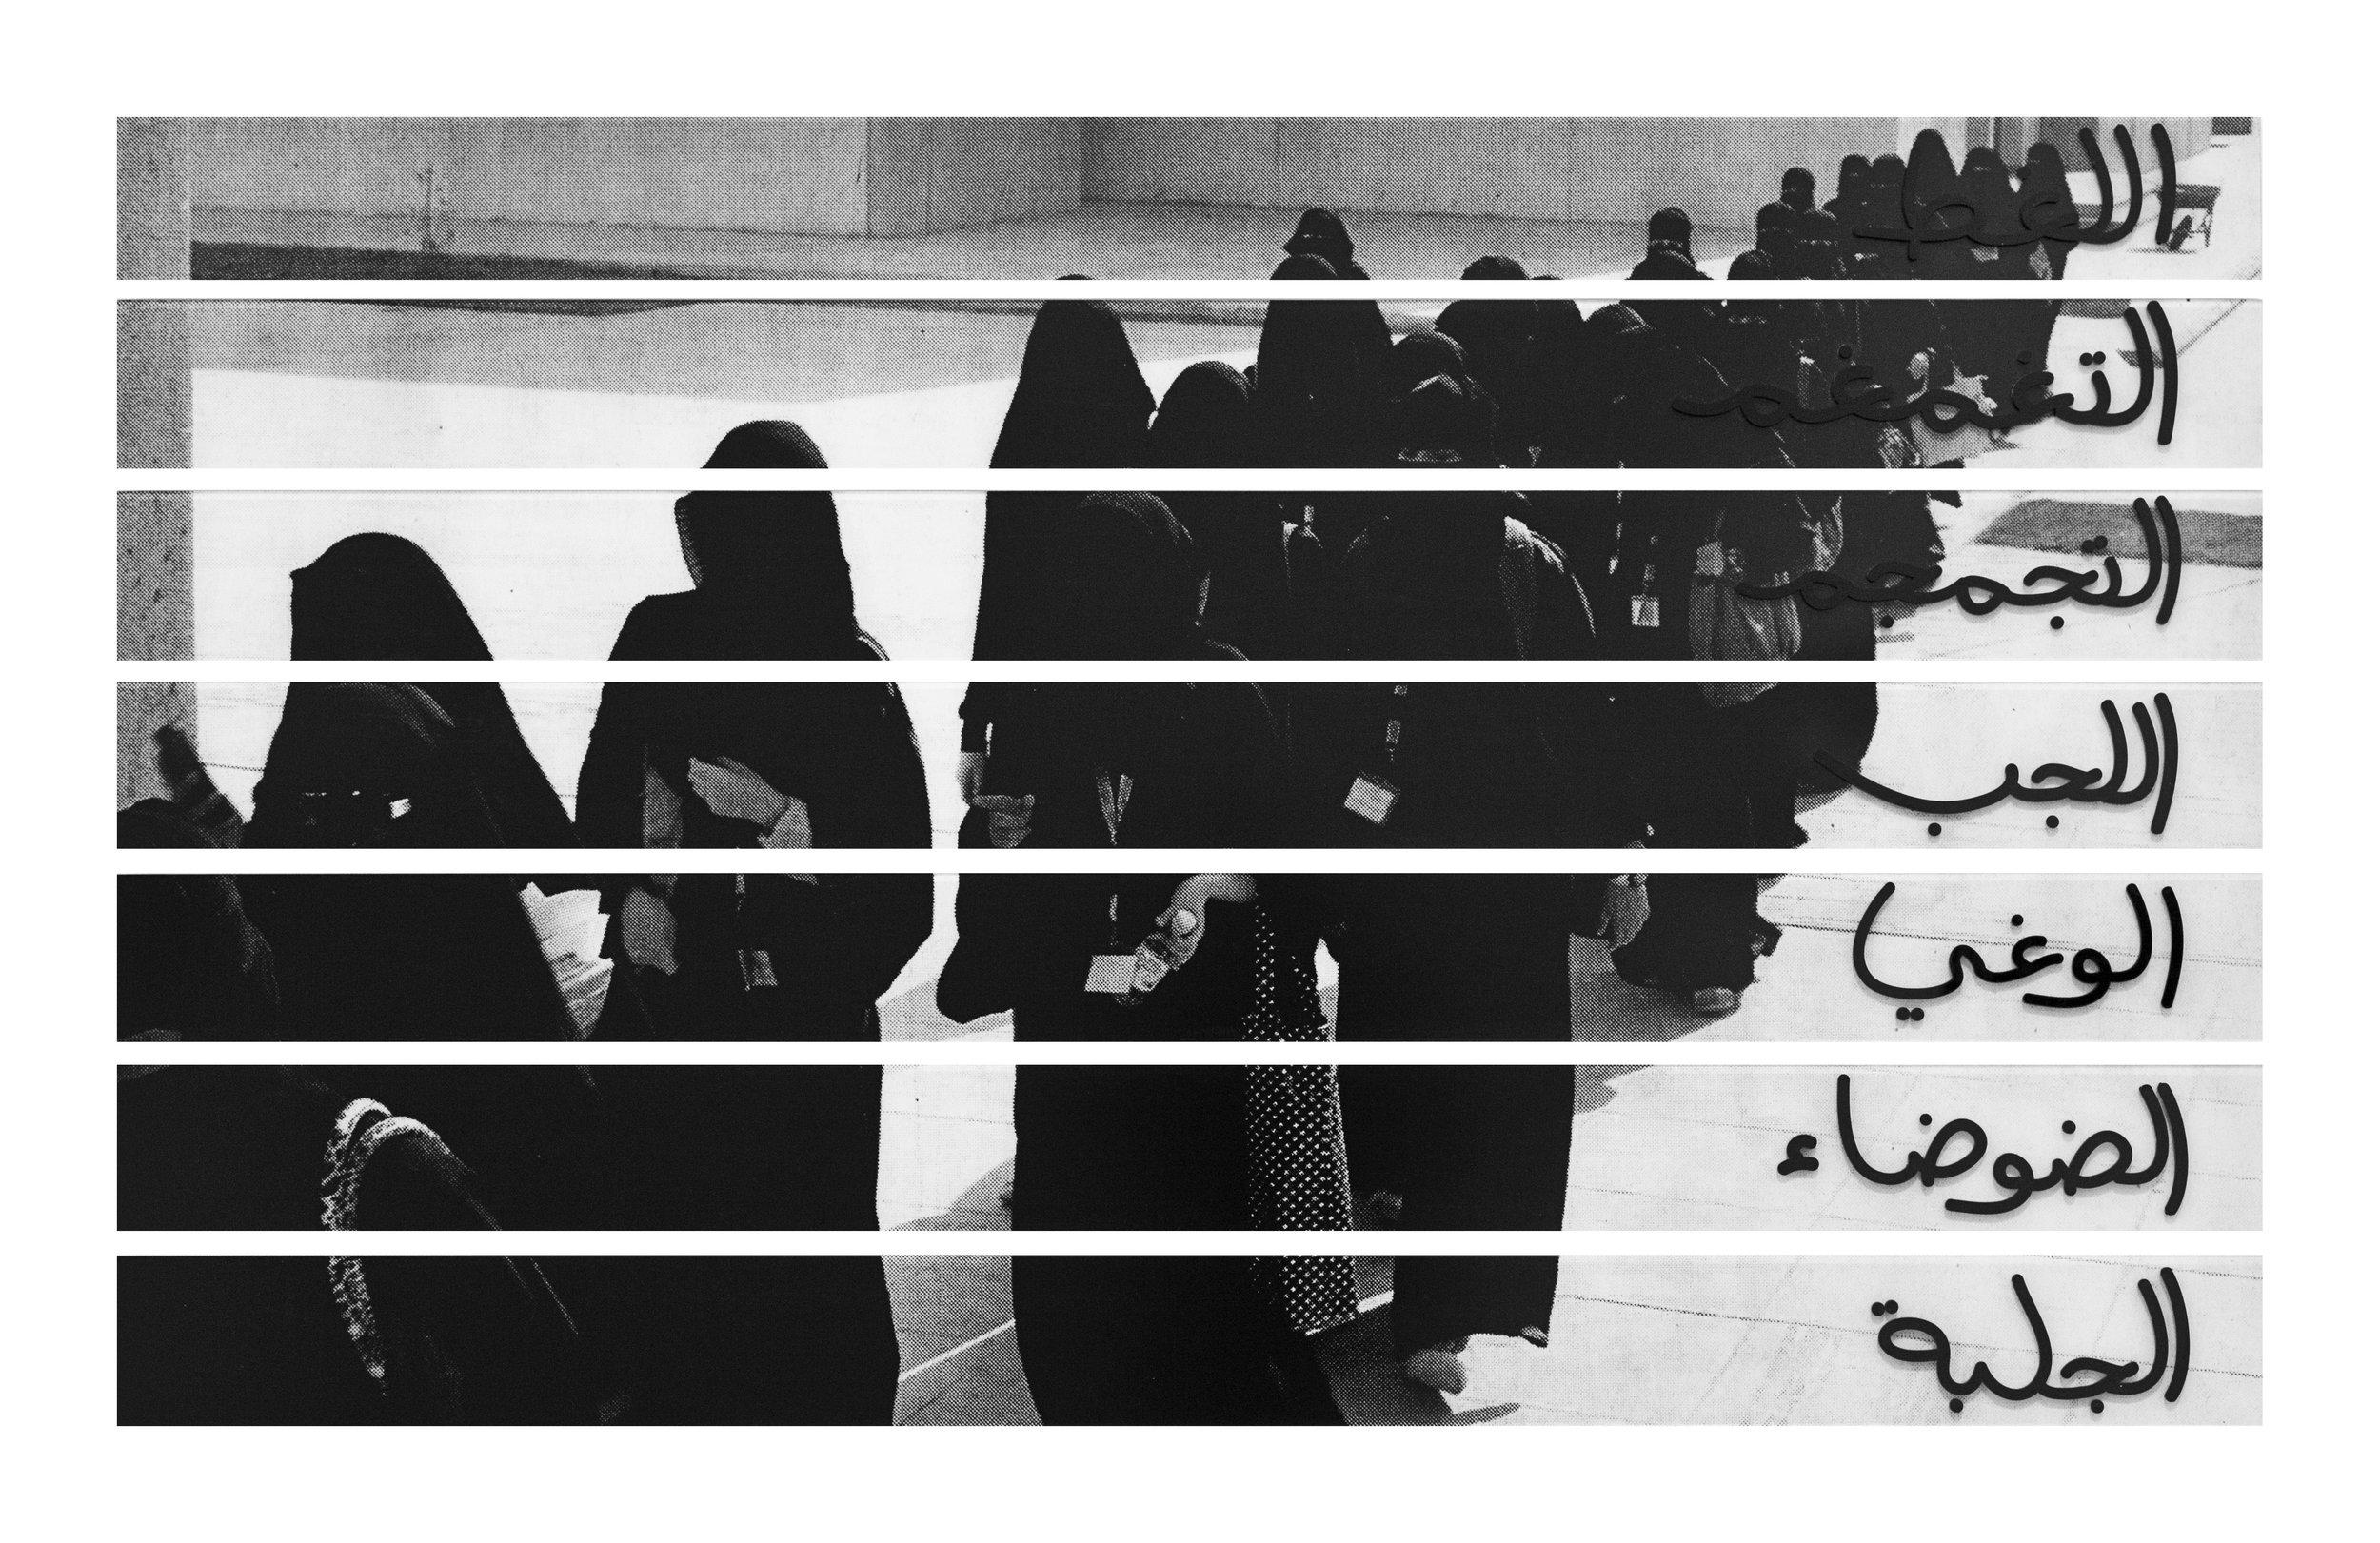 Manal AlDowayan, Misunderstood Sounds, 2013